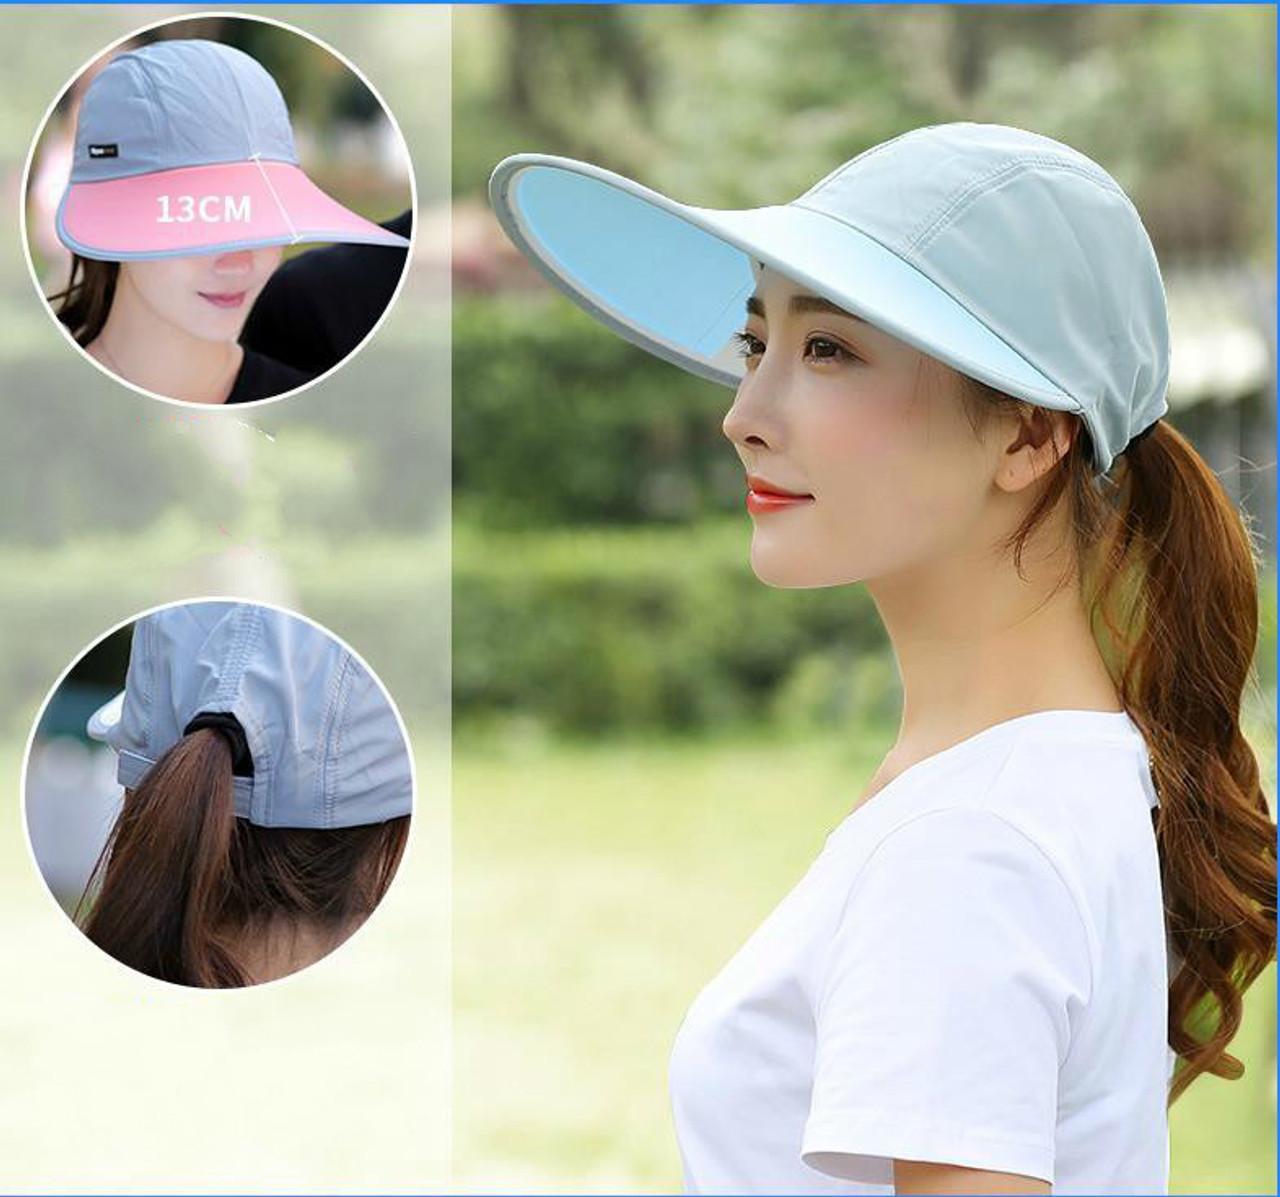 c0f12ac2 ... Summer Hat For Lovers Women Folding Foldable Uv Protection Sun Hat Visor  Suncreen Floppy Cap Chapeau ...